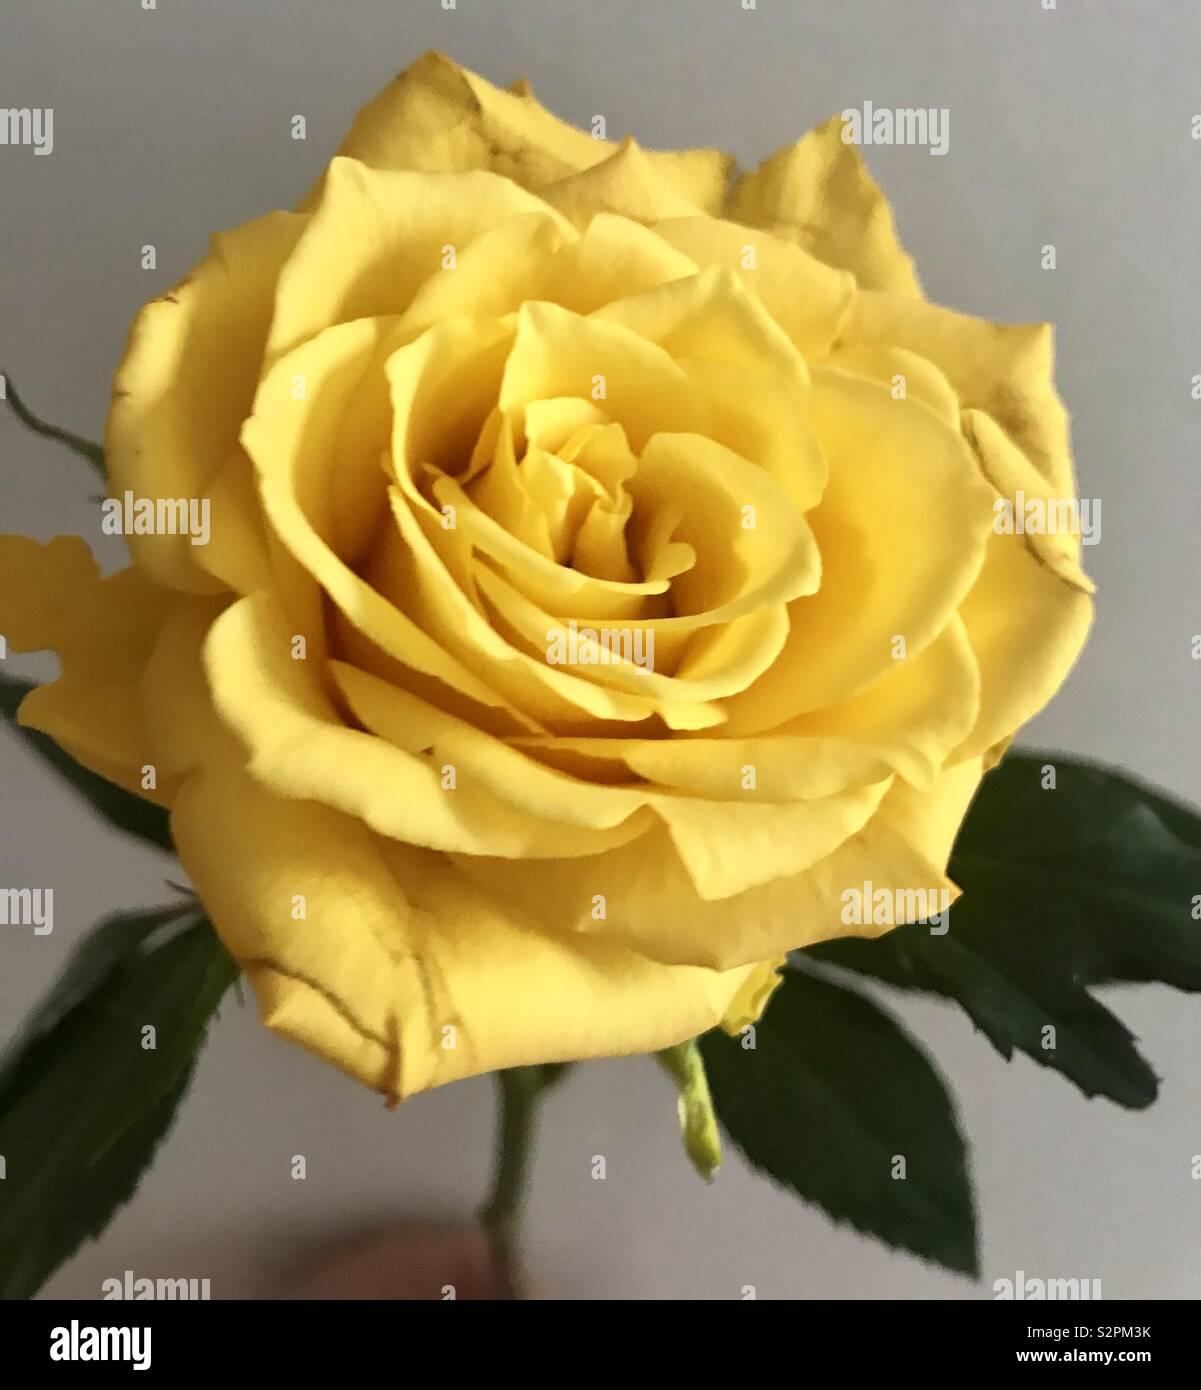 Beautiful yellow rose - Stock Image